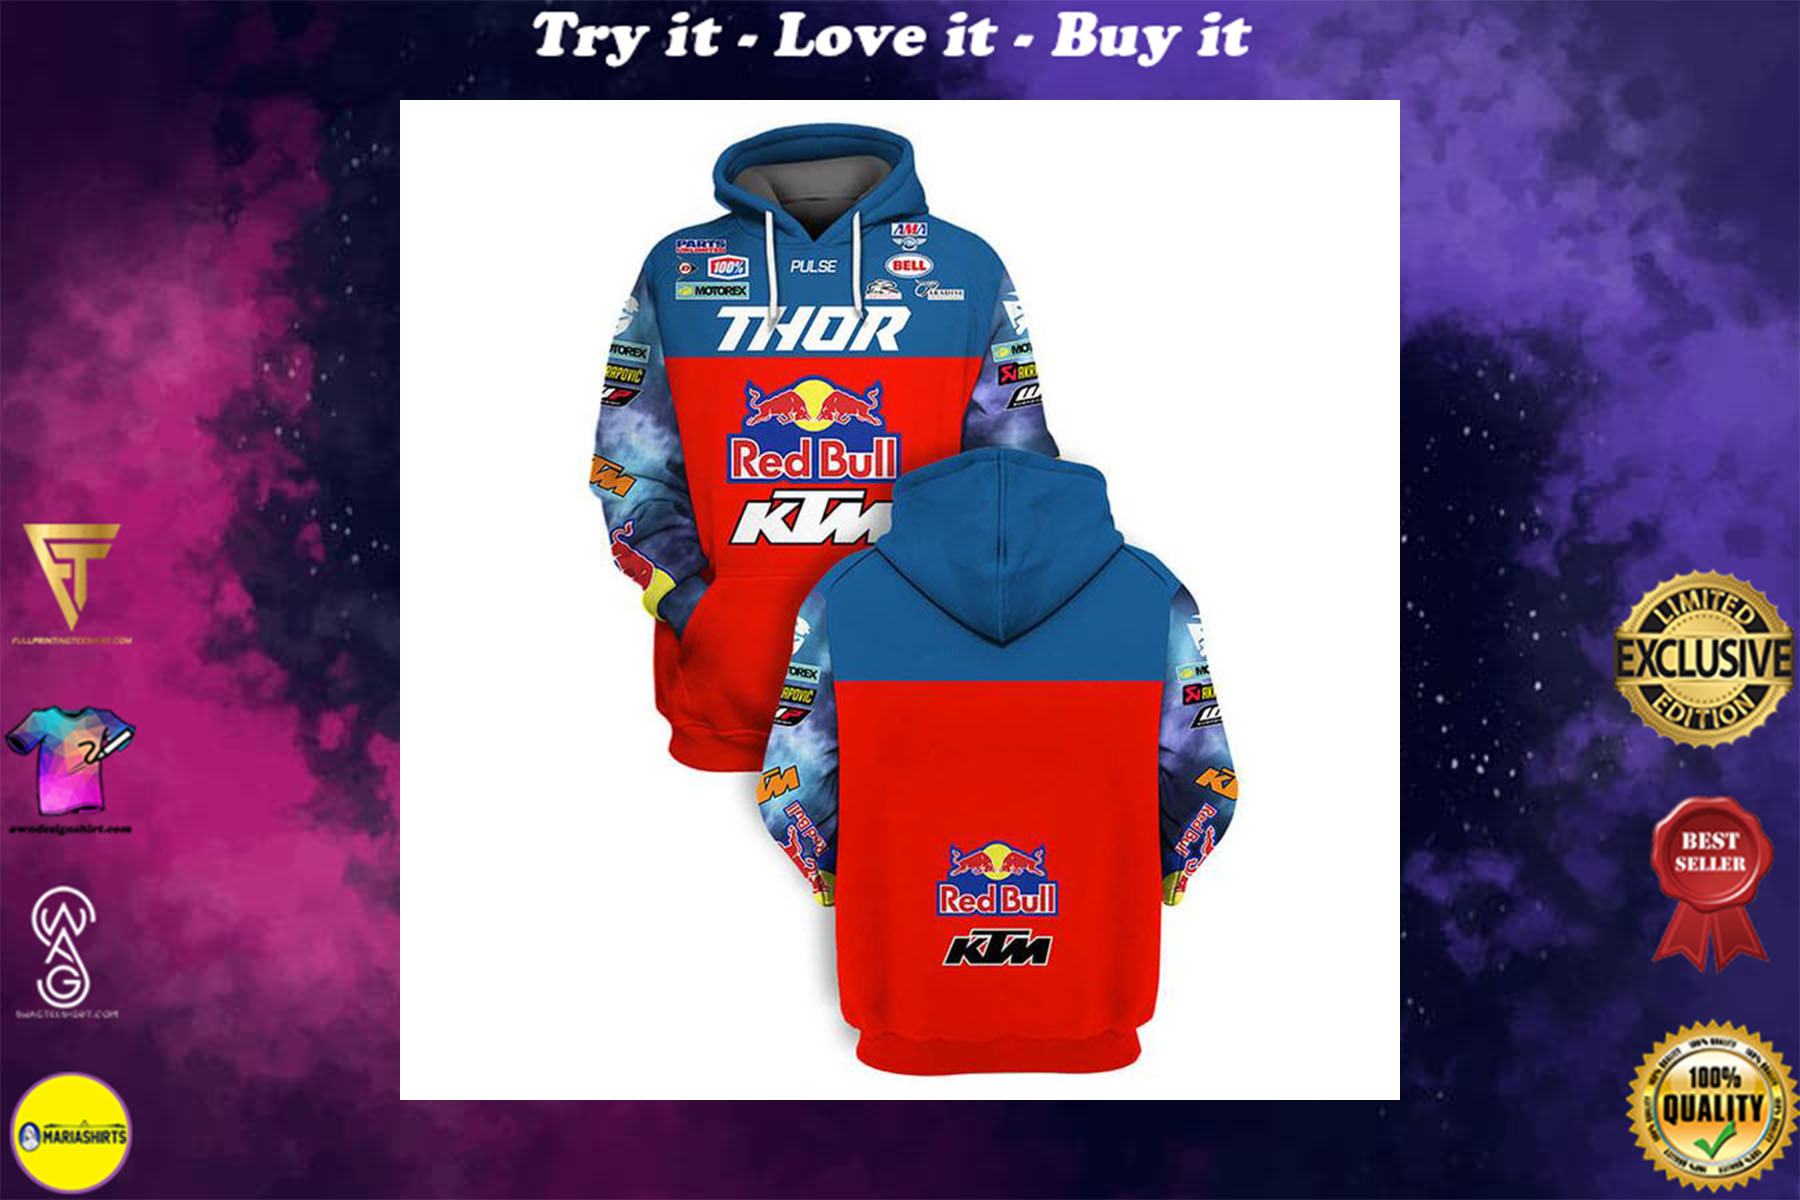 [special edition] red bull ktm racing team sports car motorcycles full printing shirt - maria